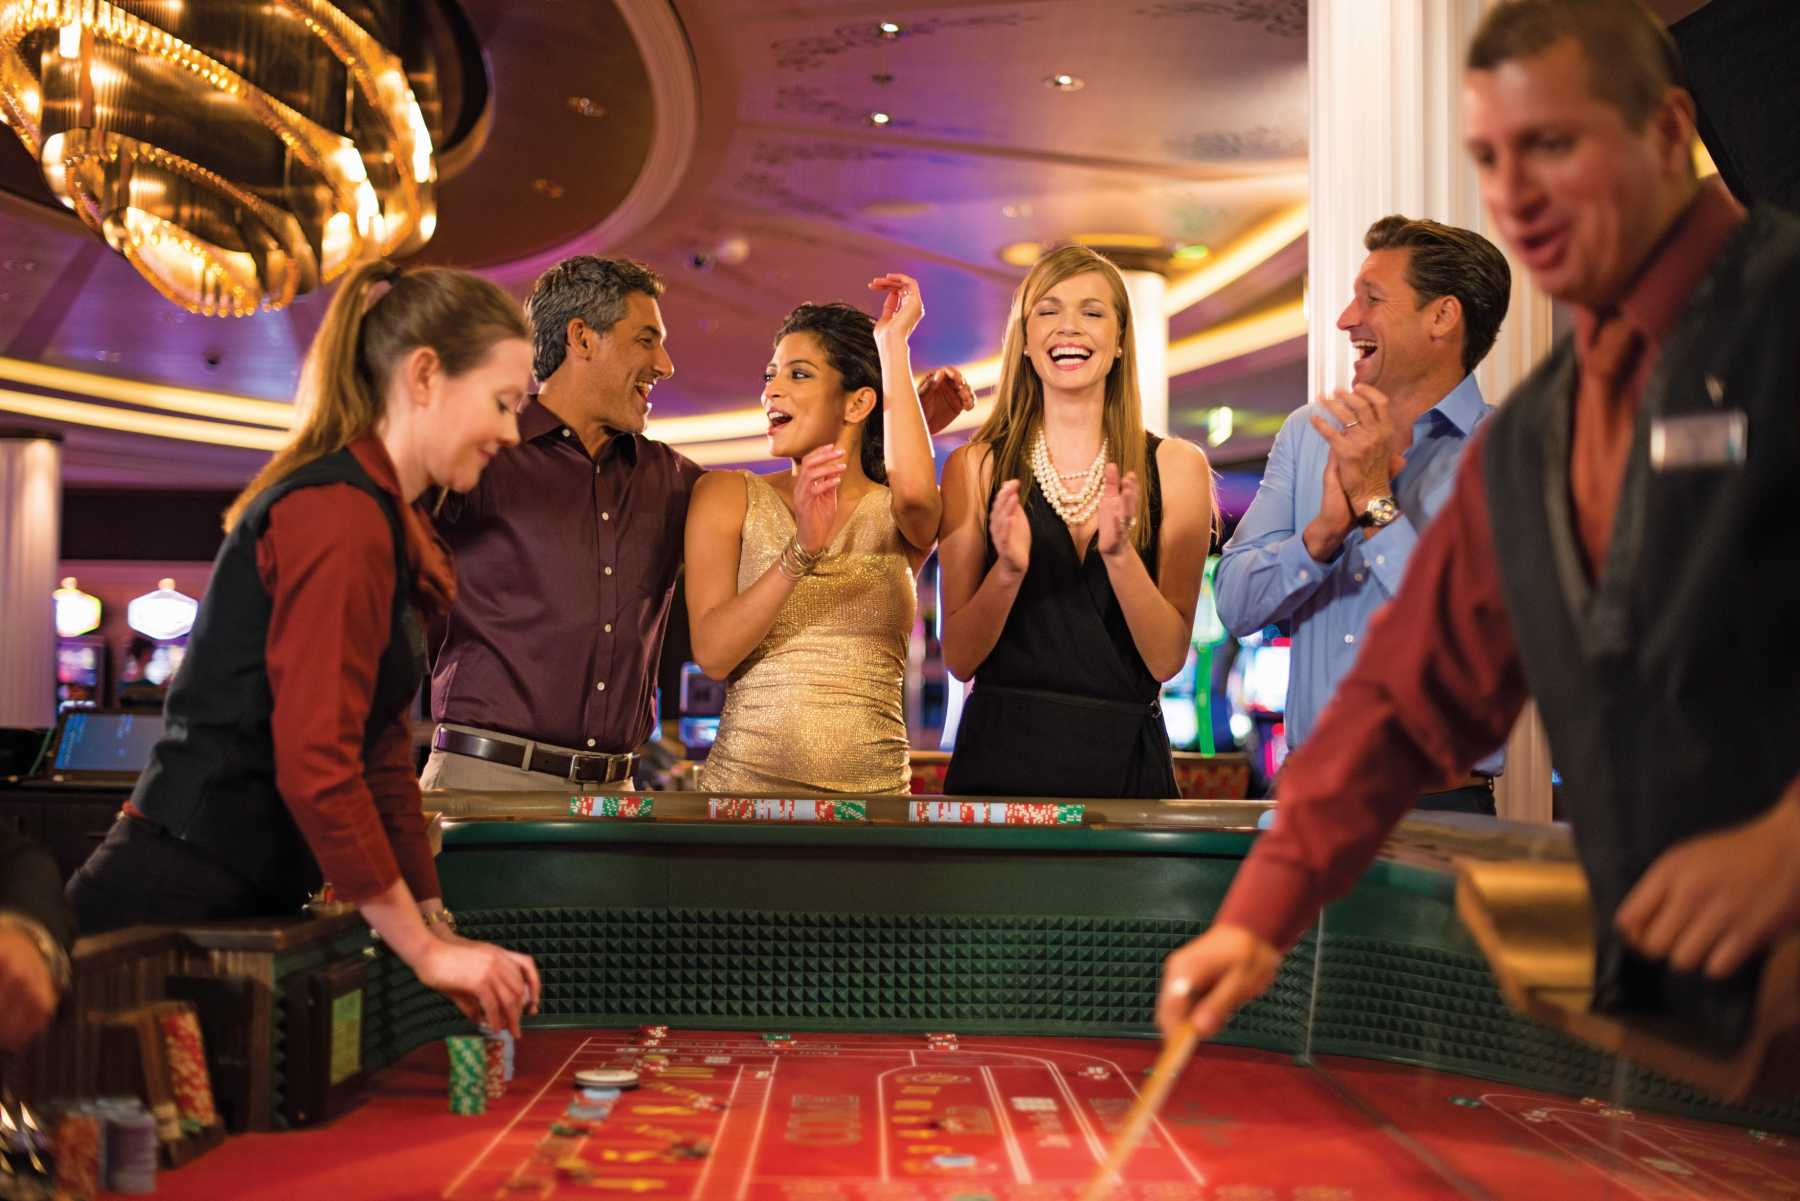 celebrity cruises celebrity equinox casino.jpg